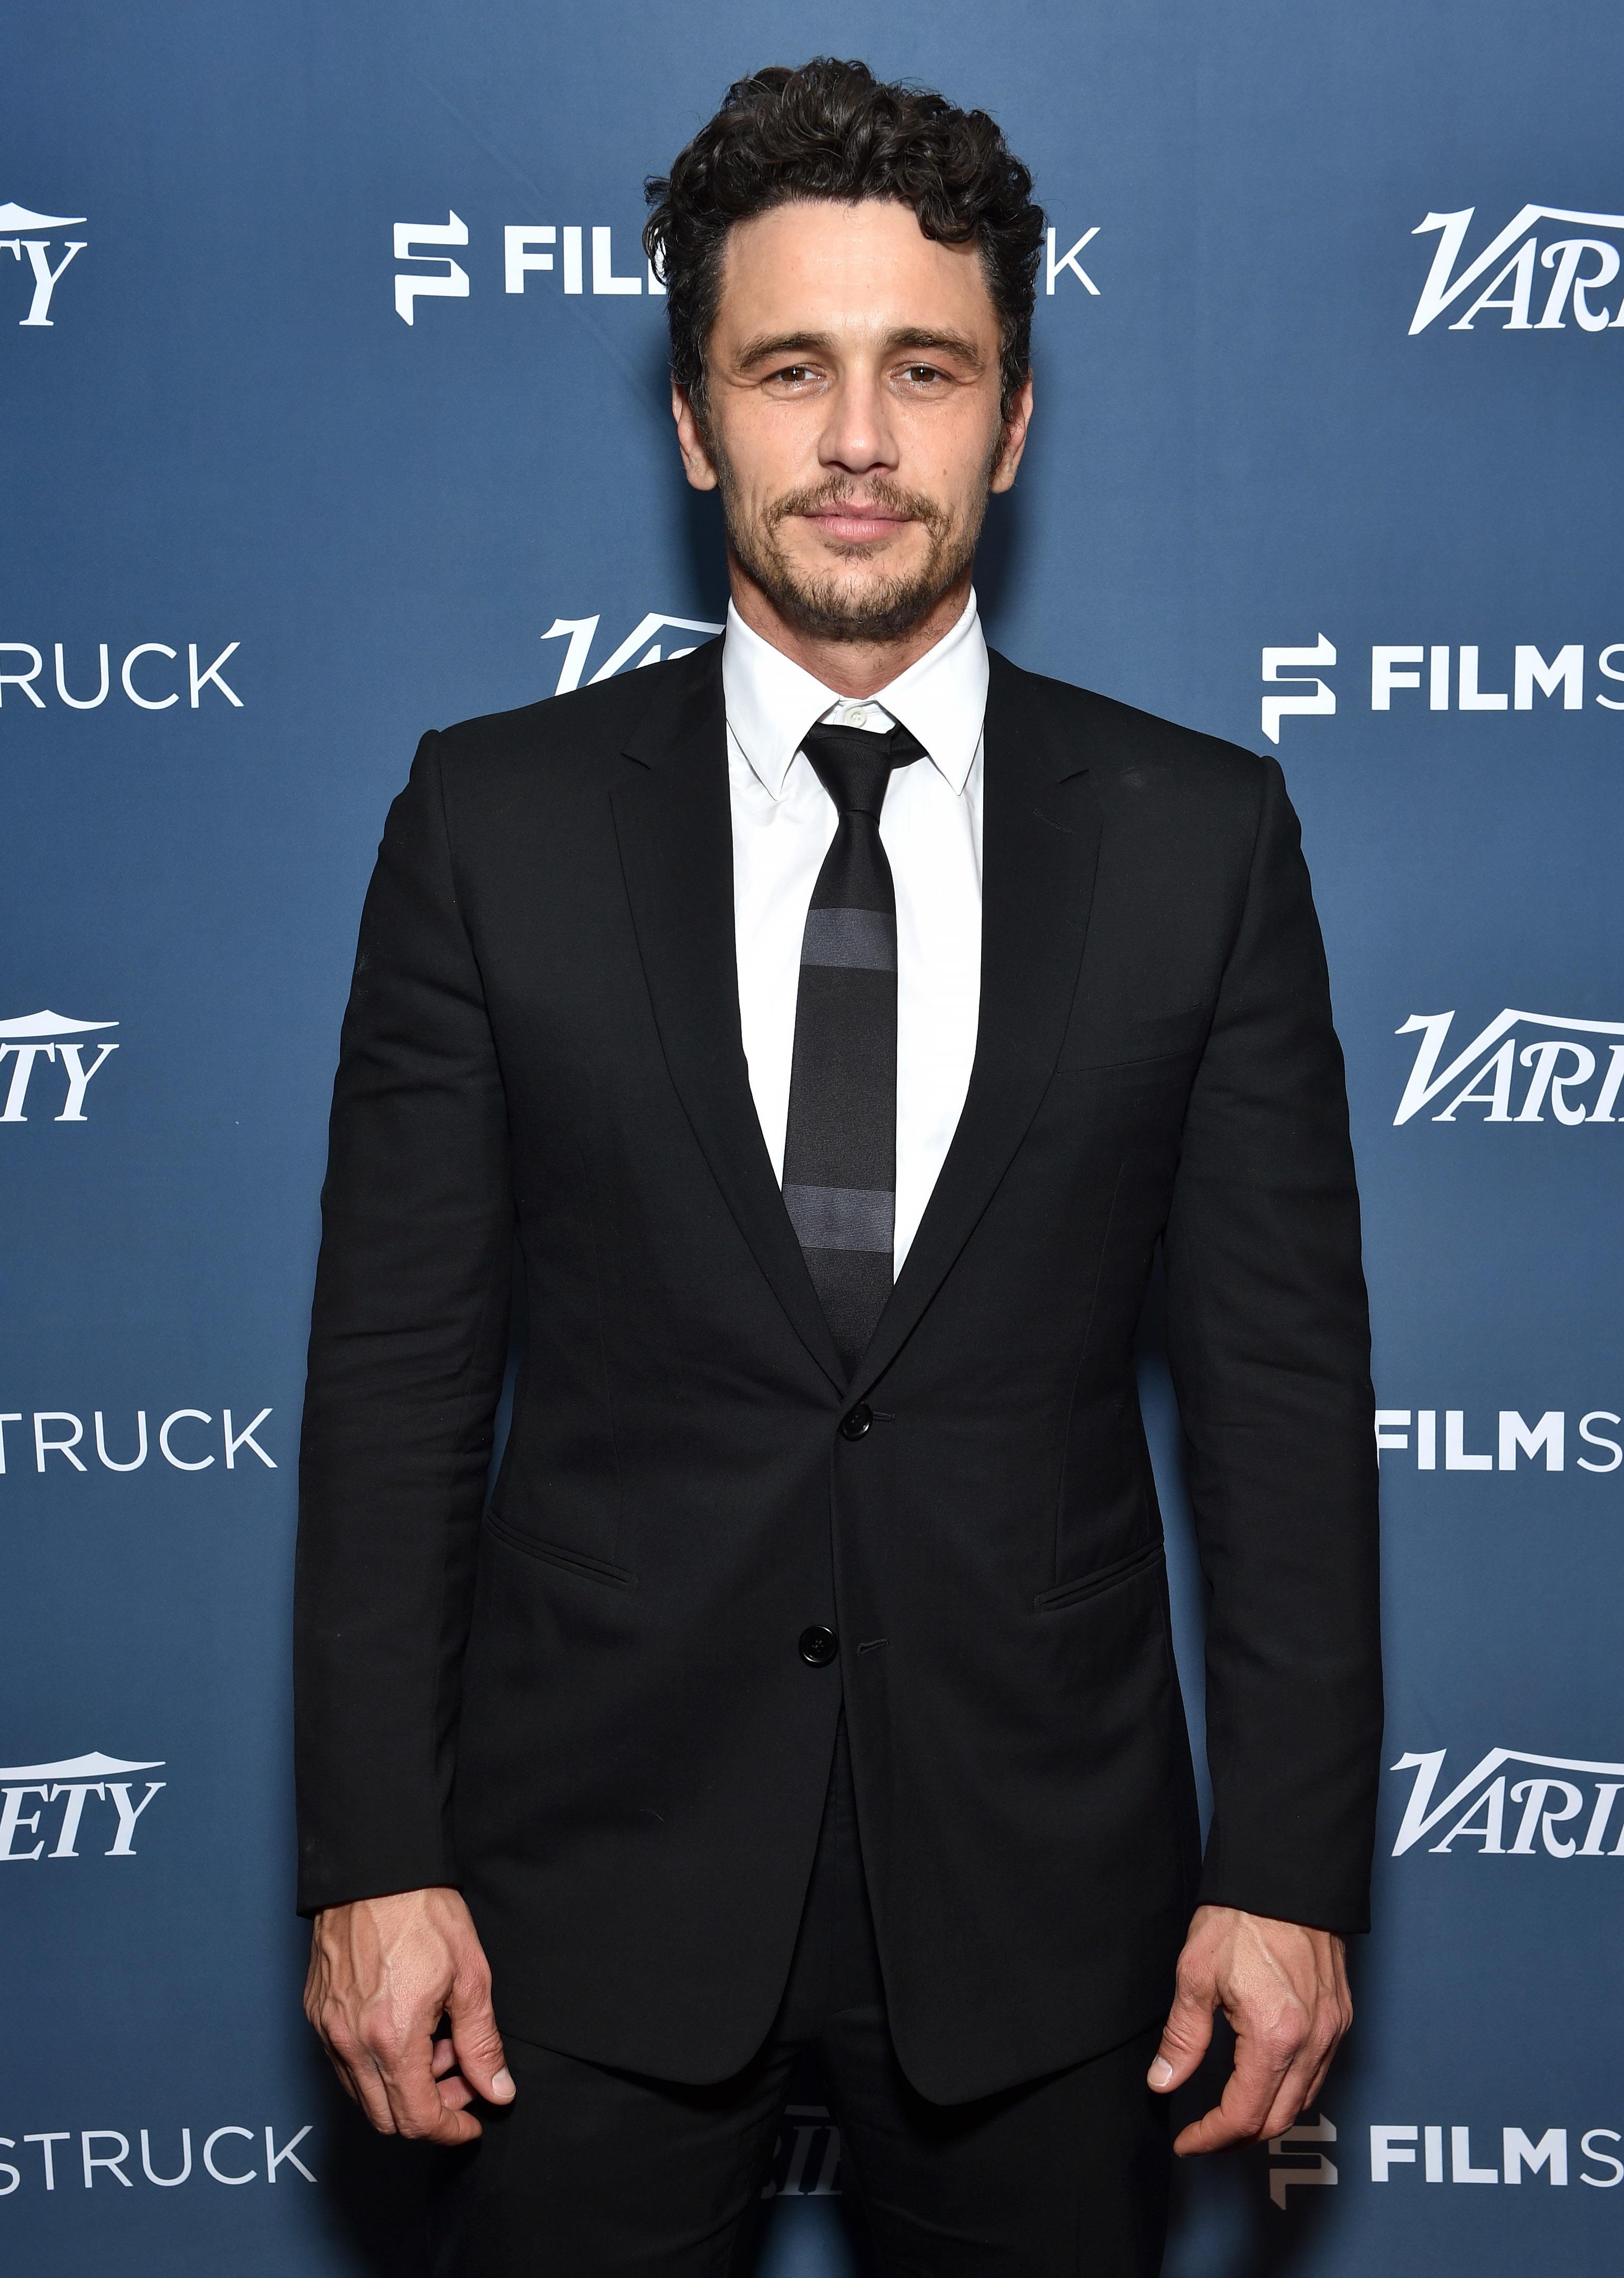 How James Franco feels about his Oscar snub